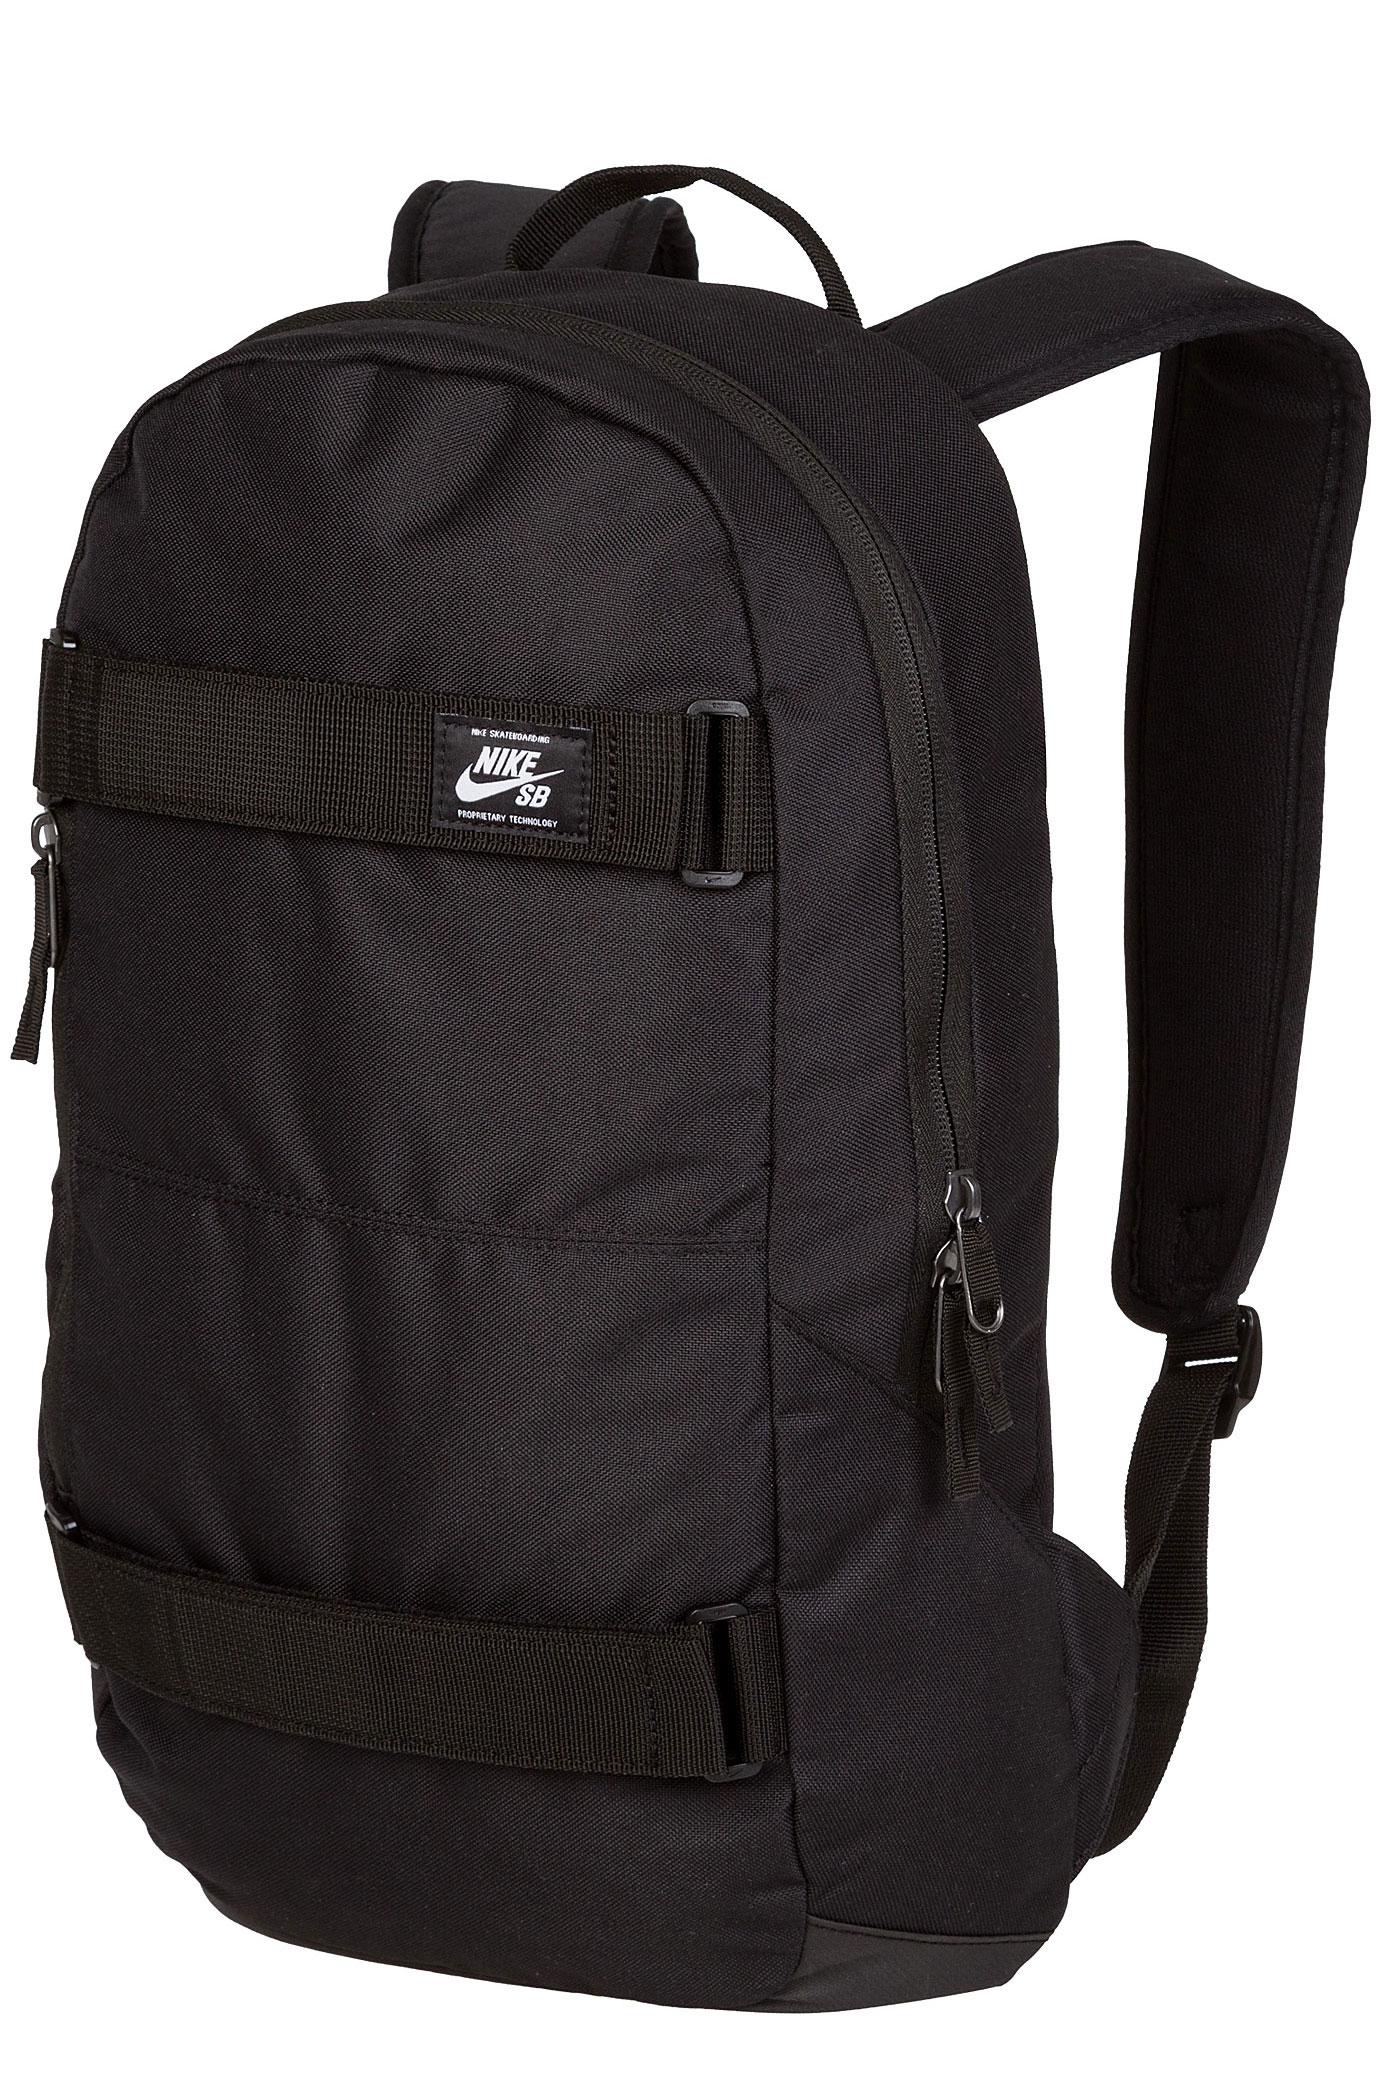 Buy nike white backpack   OFF78% Discounted 678d687e877cf